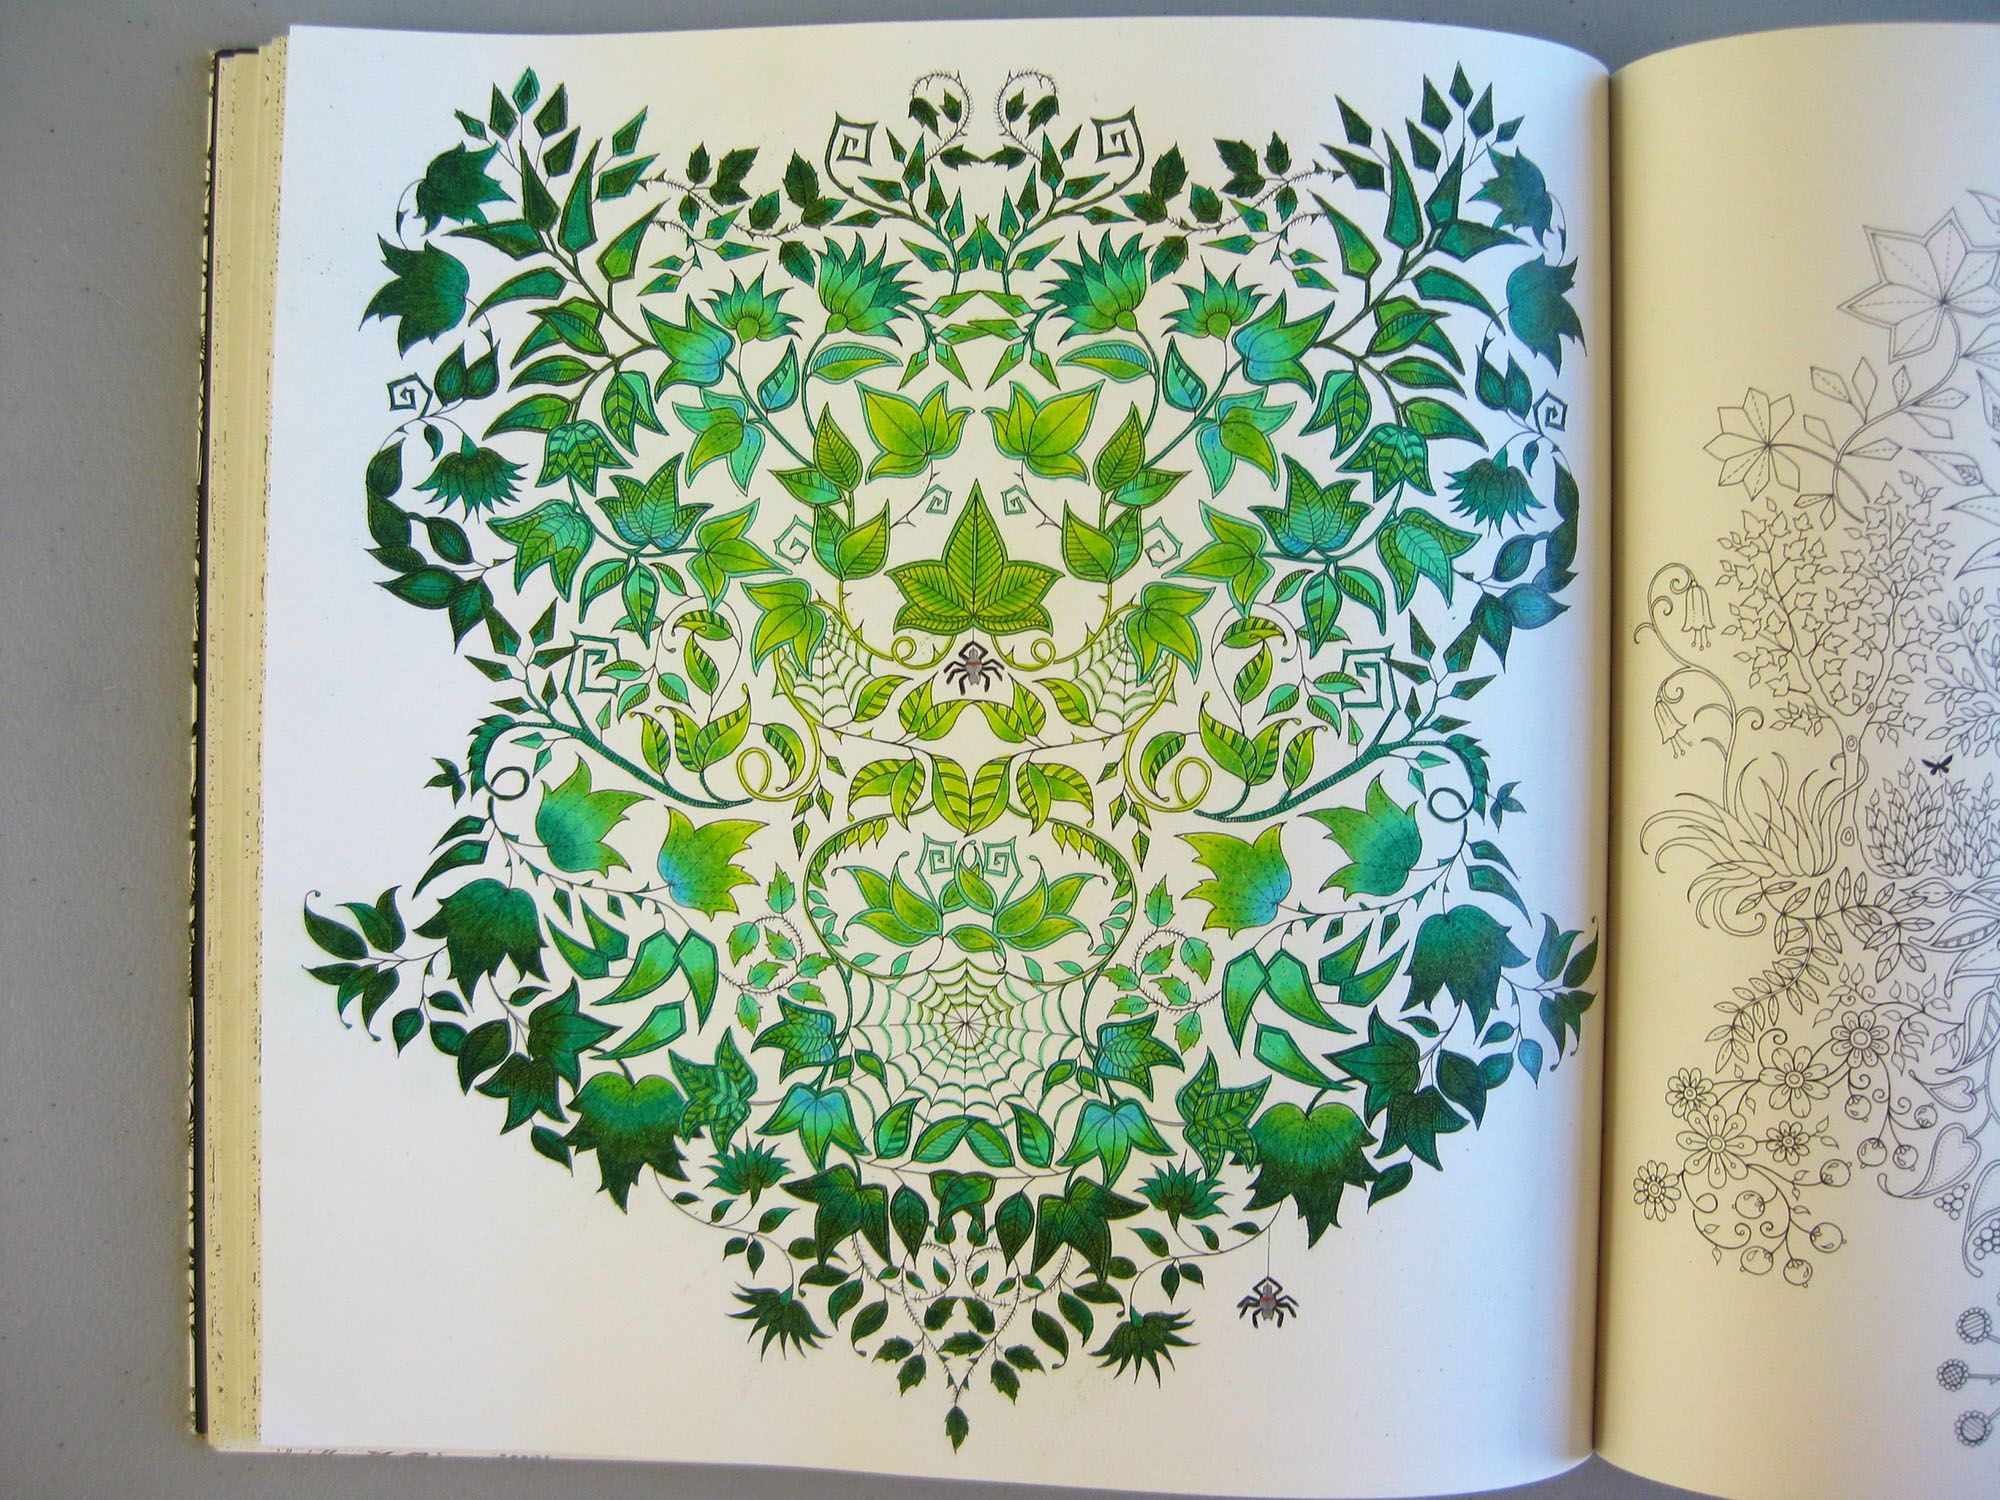 Таинственный сад бэсфорд картинки великого